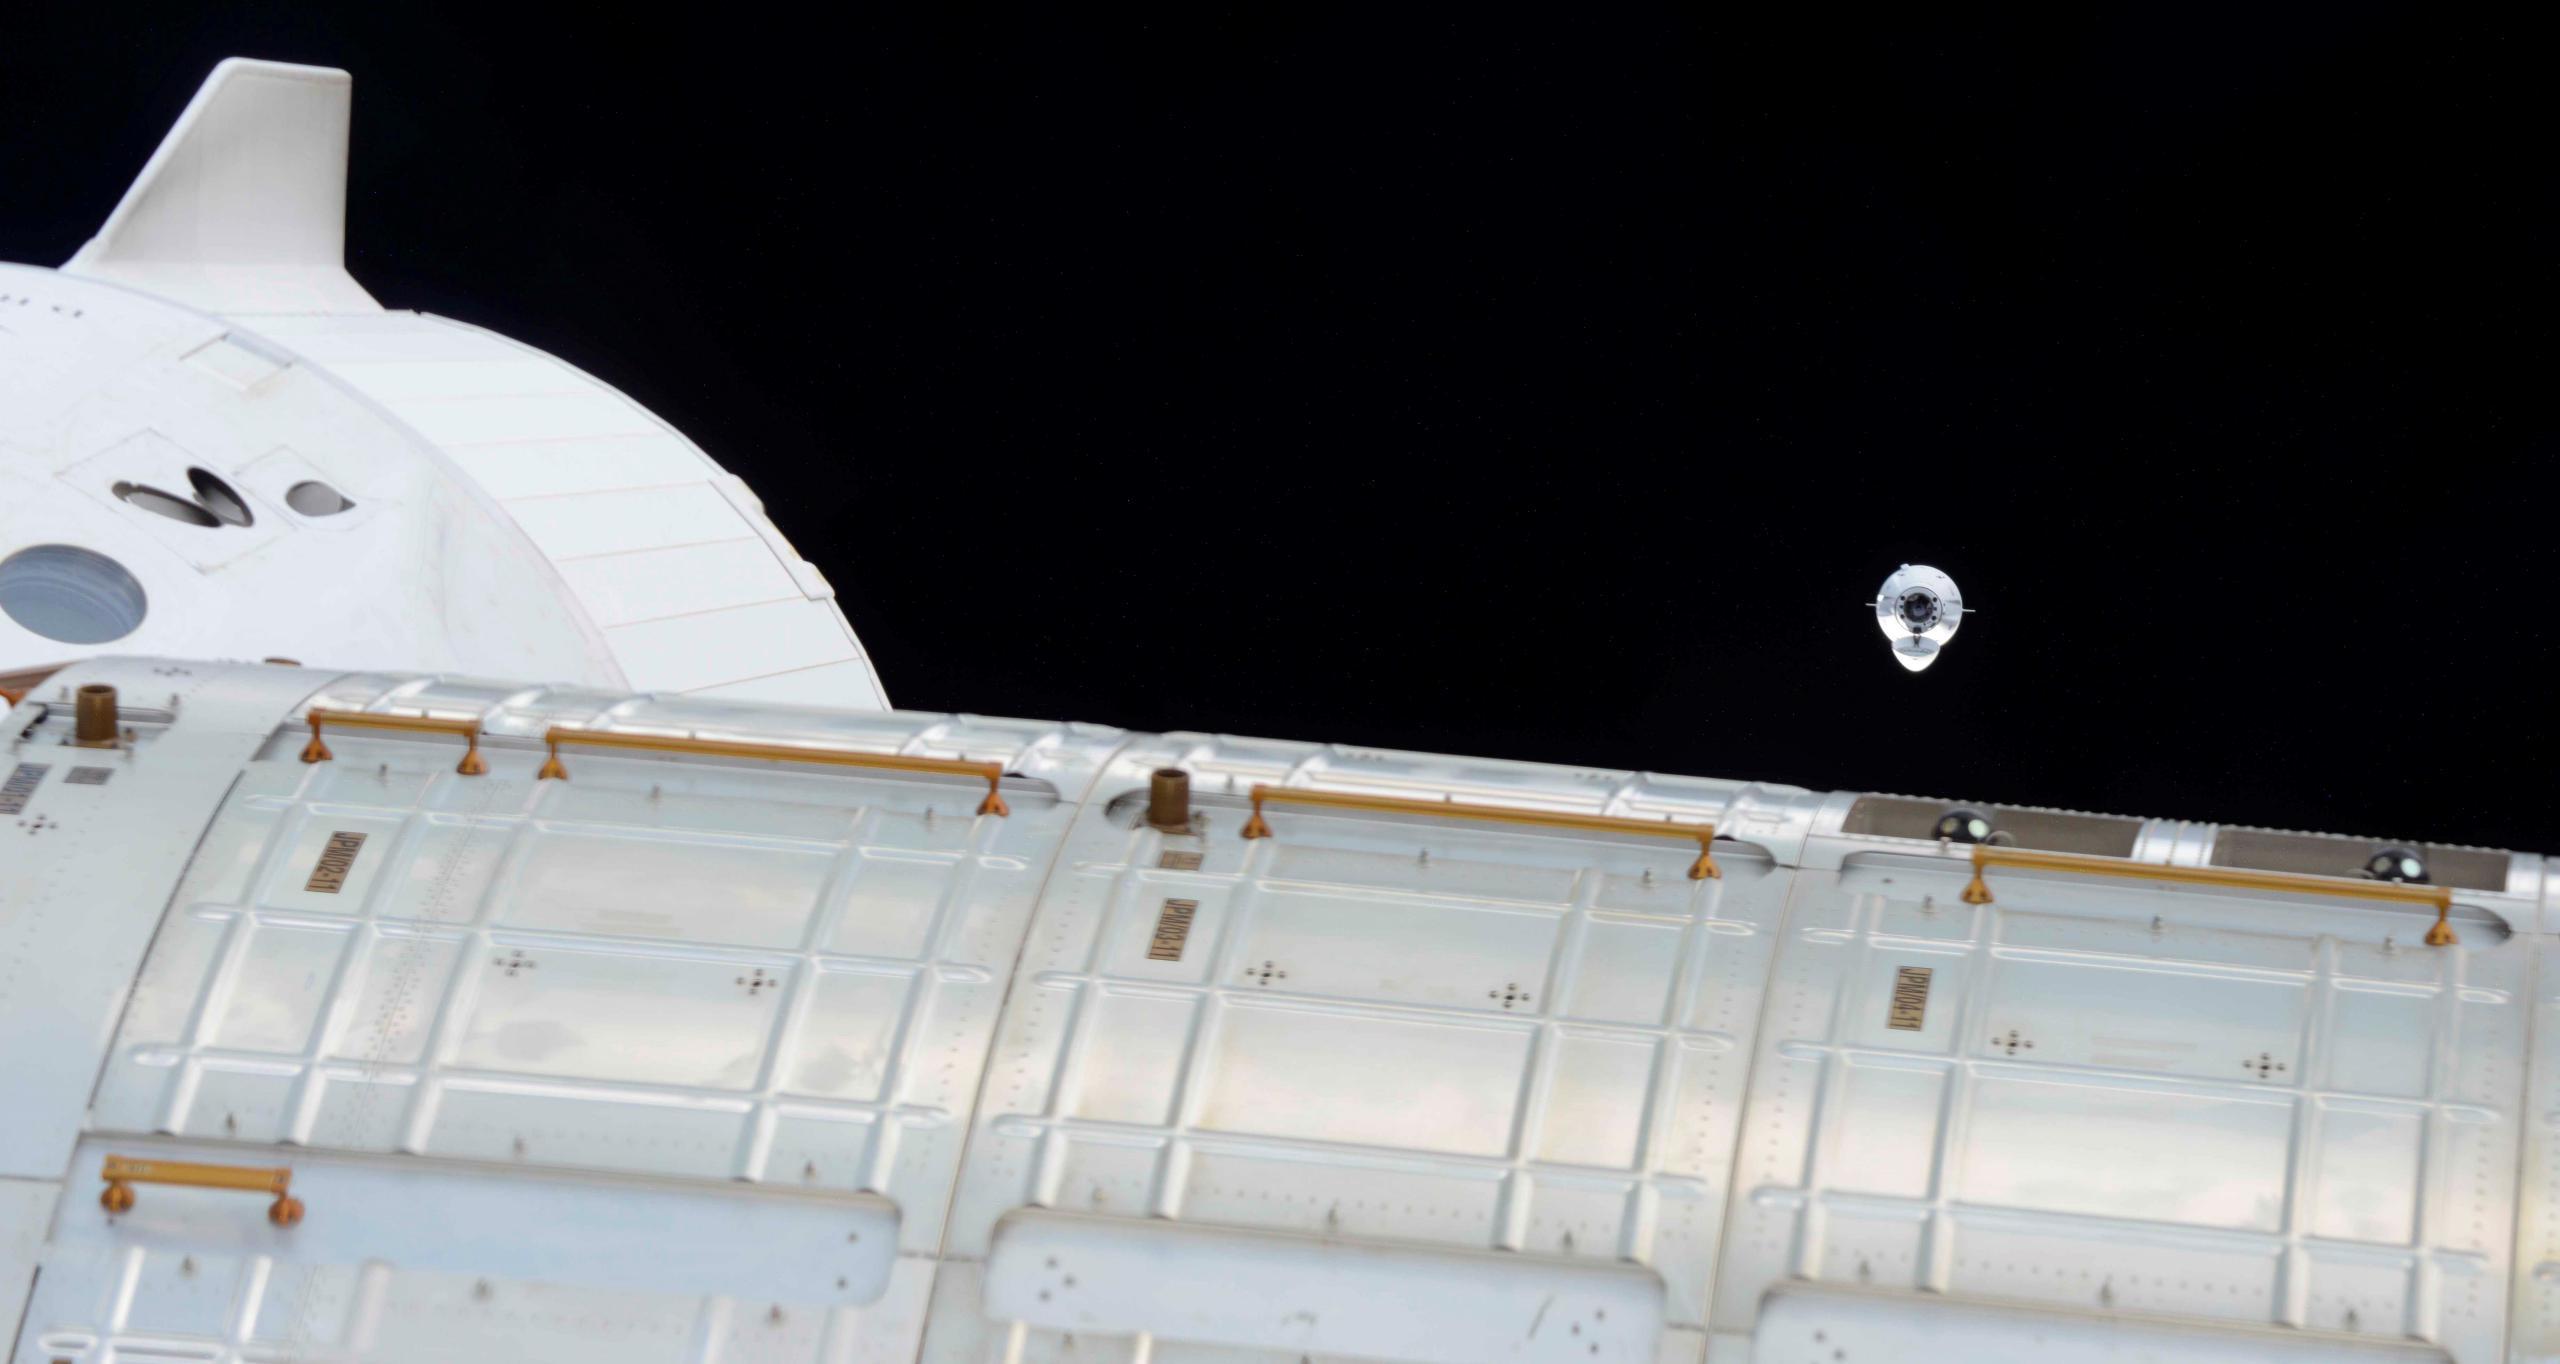 CRS-22 Cargo Dragon C209 June 2021 (Roscosmos) ISS arrival Crew-2 1 crop (c)